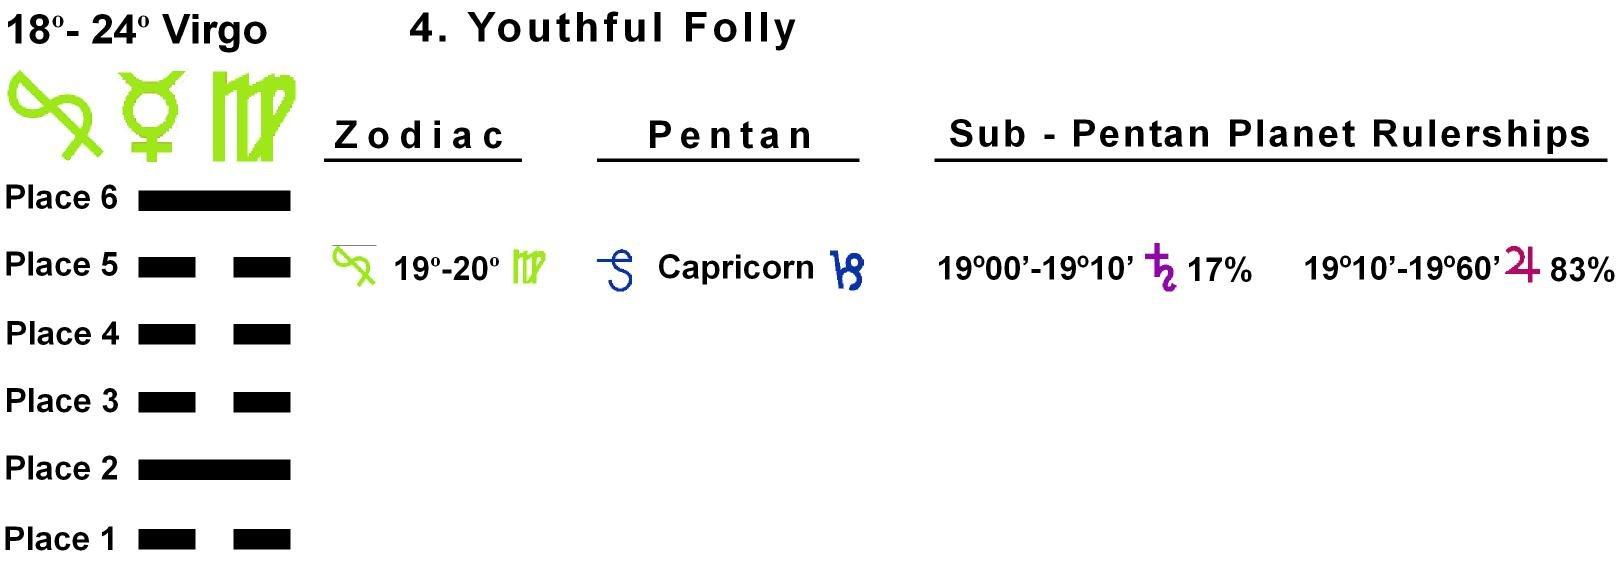 Pent-lines-06VI 19-20 Hx-04 Youthful Folly